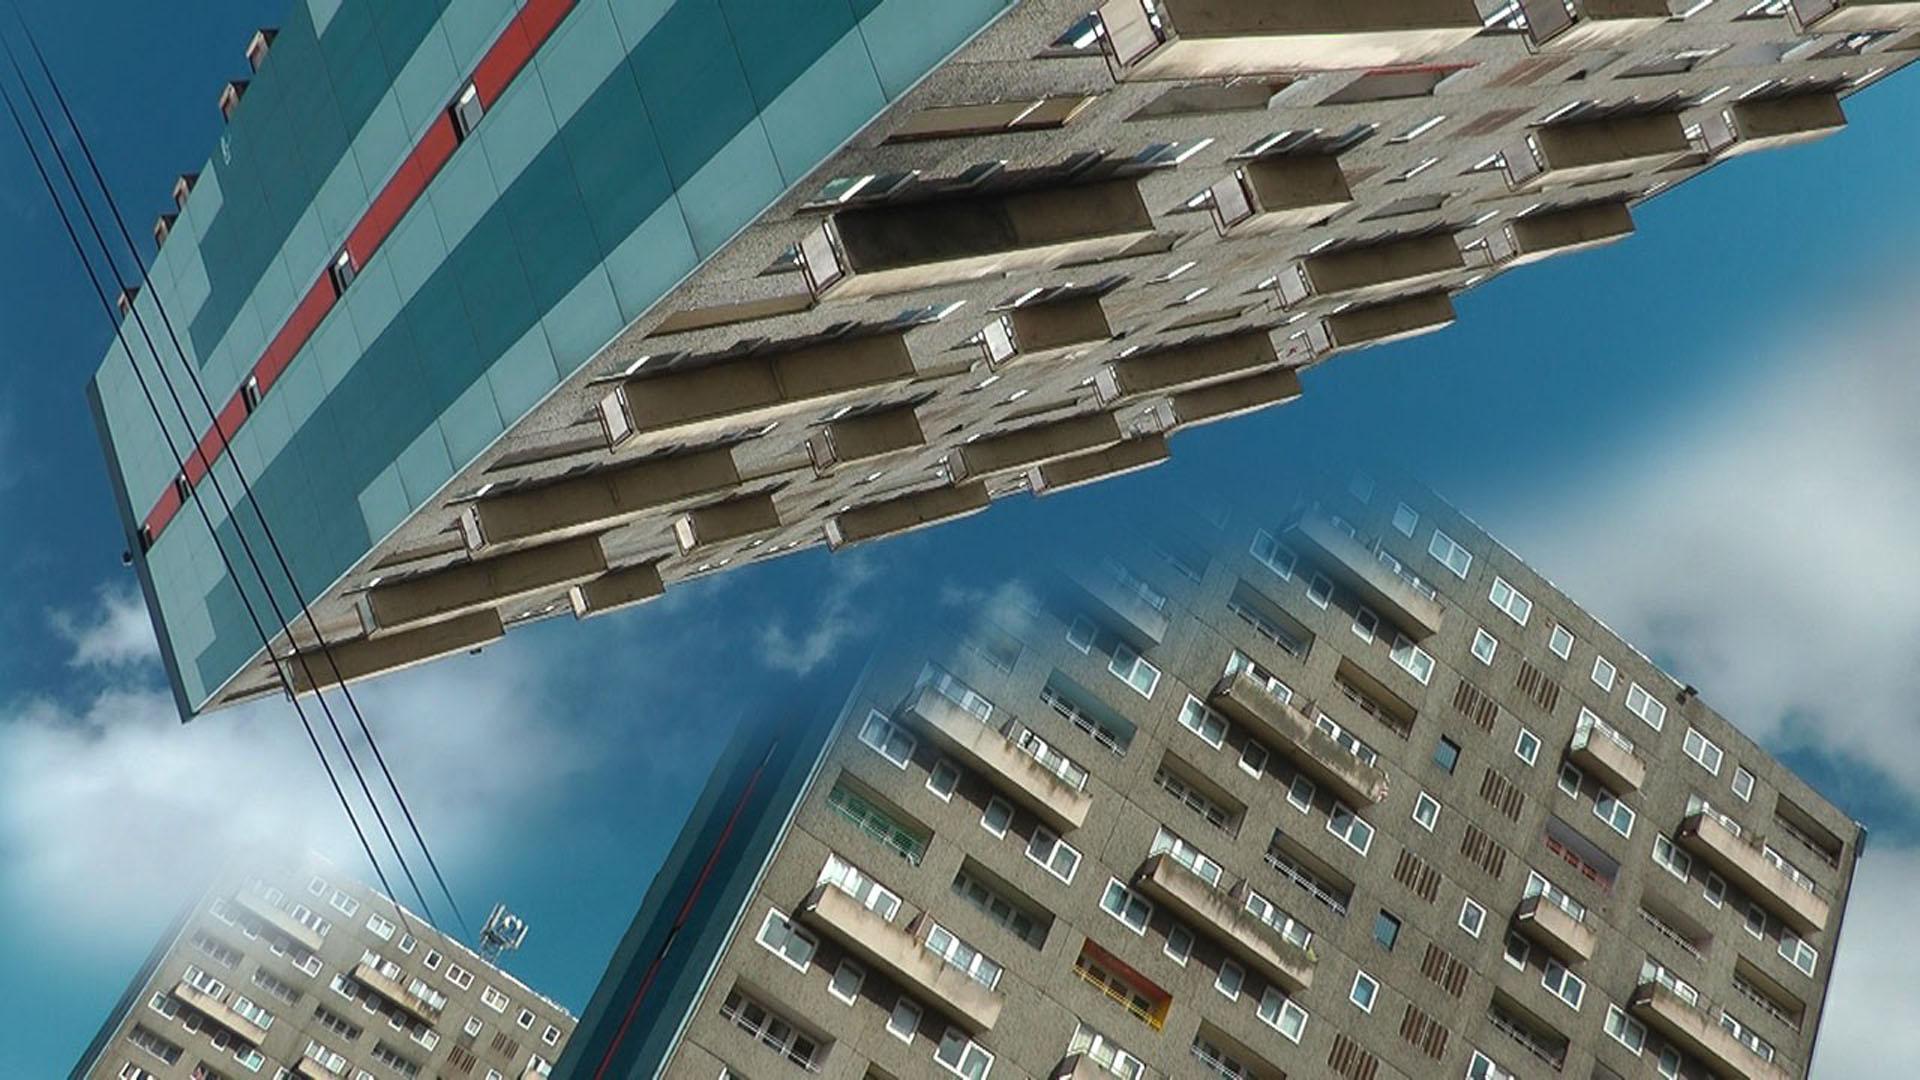 ©2013-2014, Myriam Thyes, Apotheosis of Glasgow High-rises